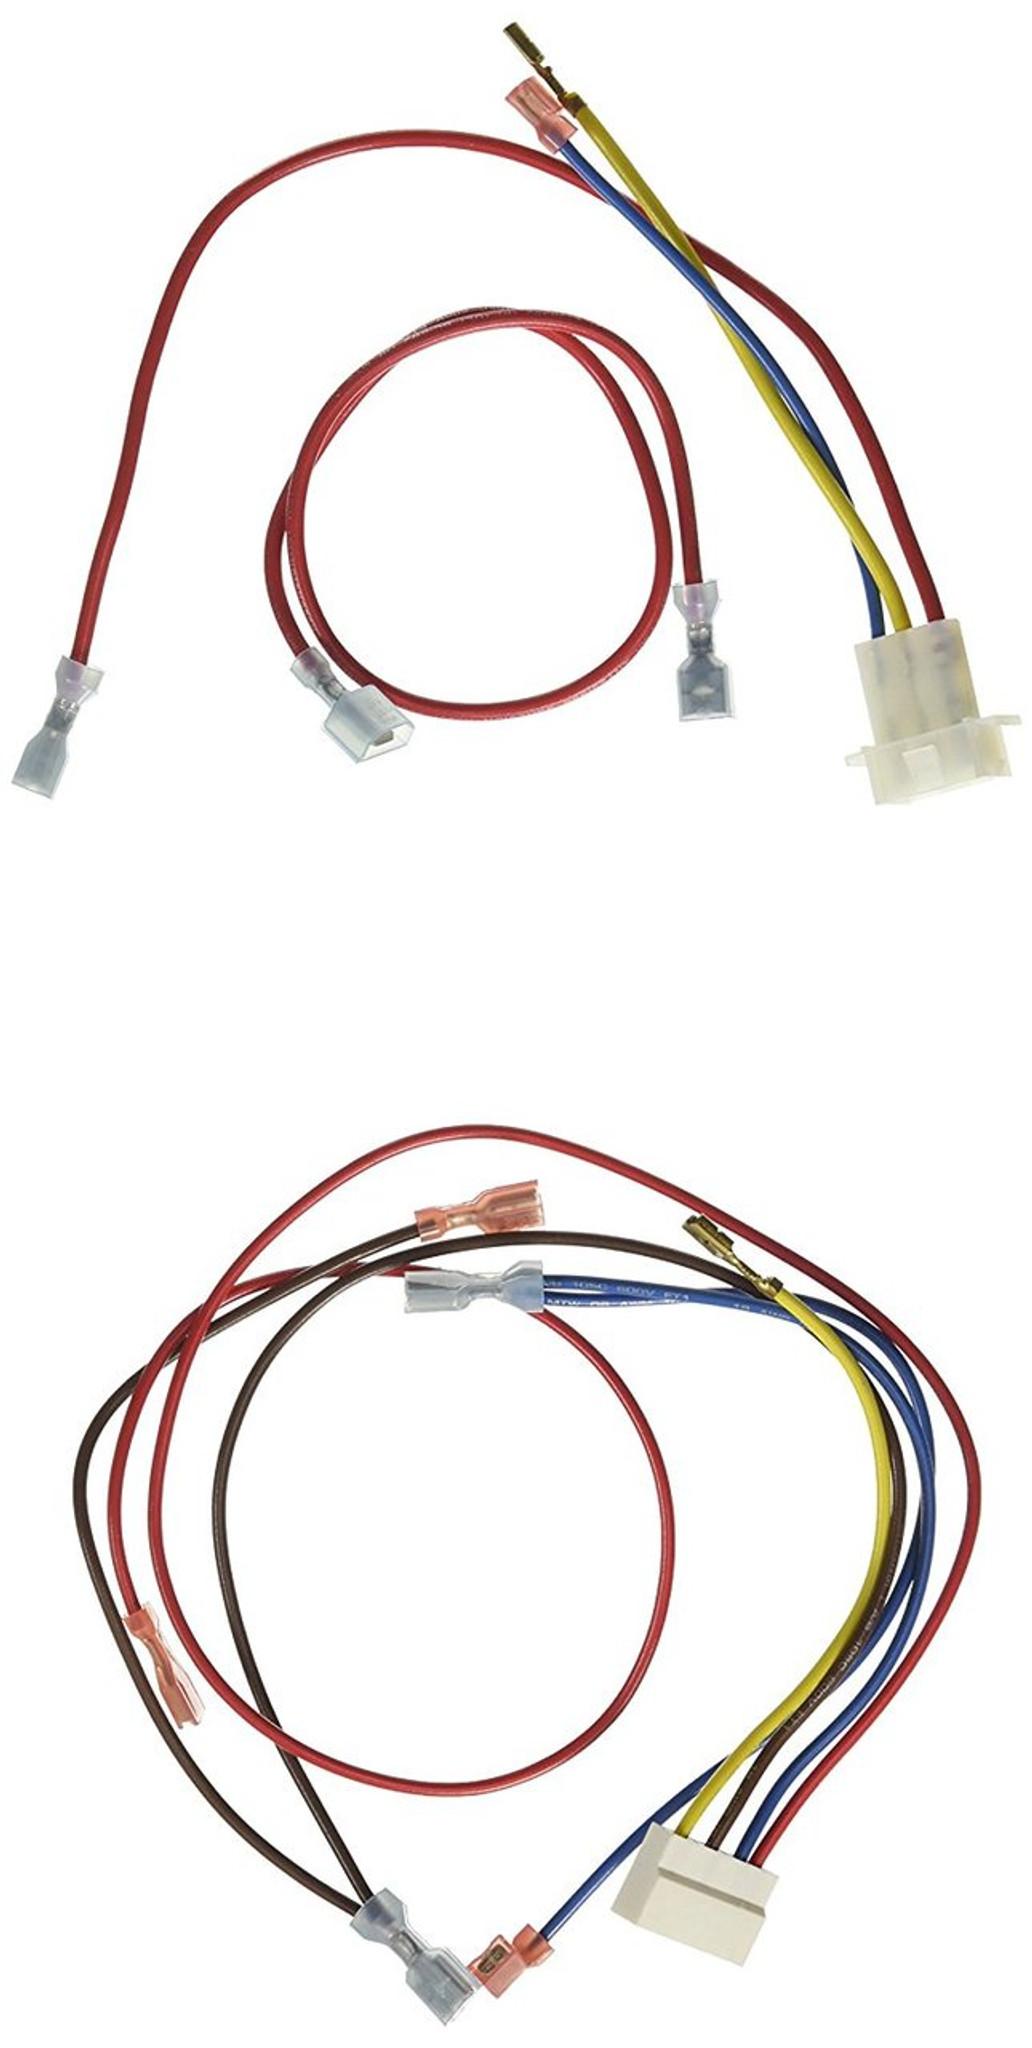 Suburban Furnace Wiring Harness 520839 (NT Series) on